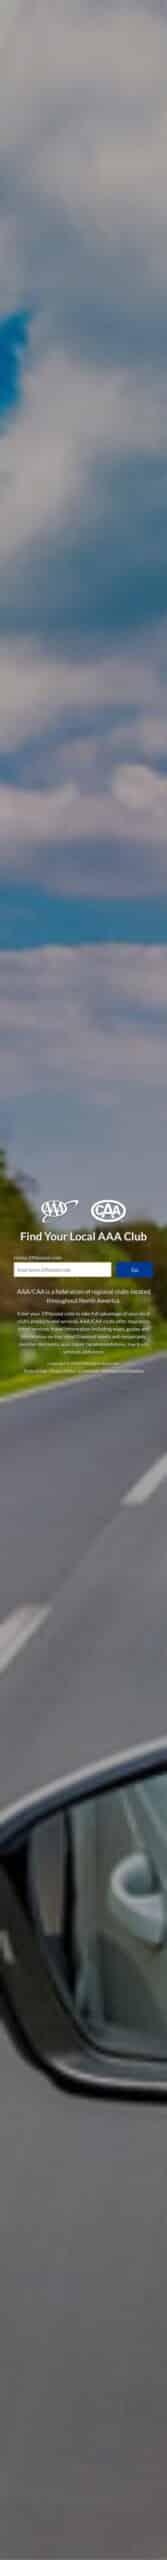 AAA - Auto Club Coupon